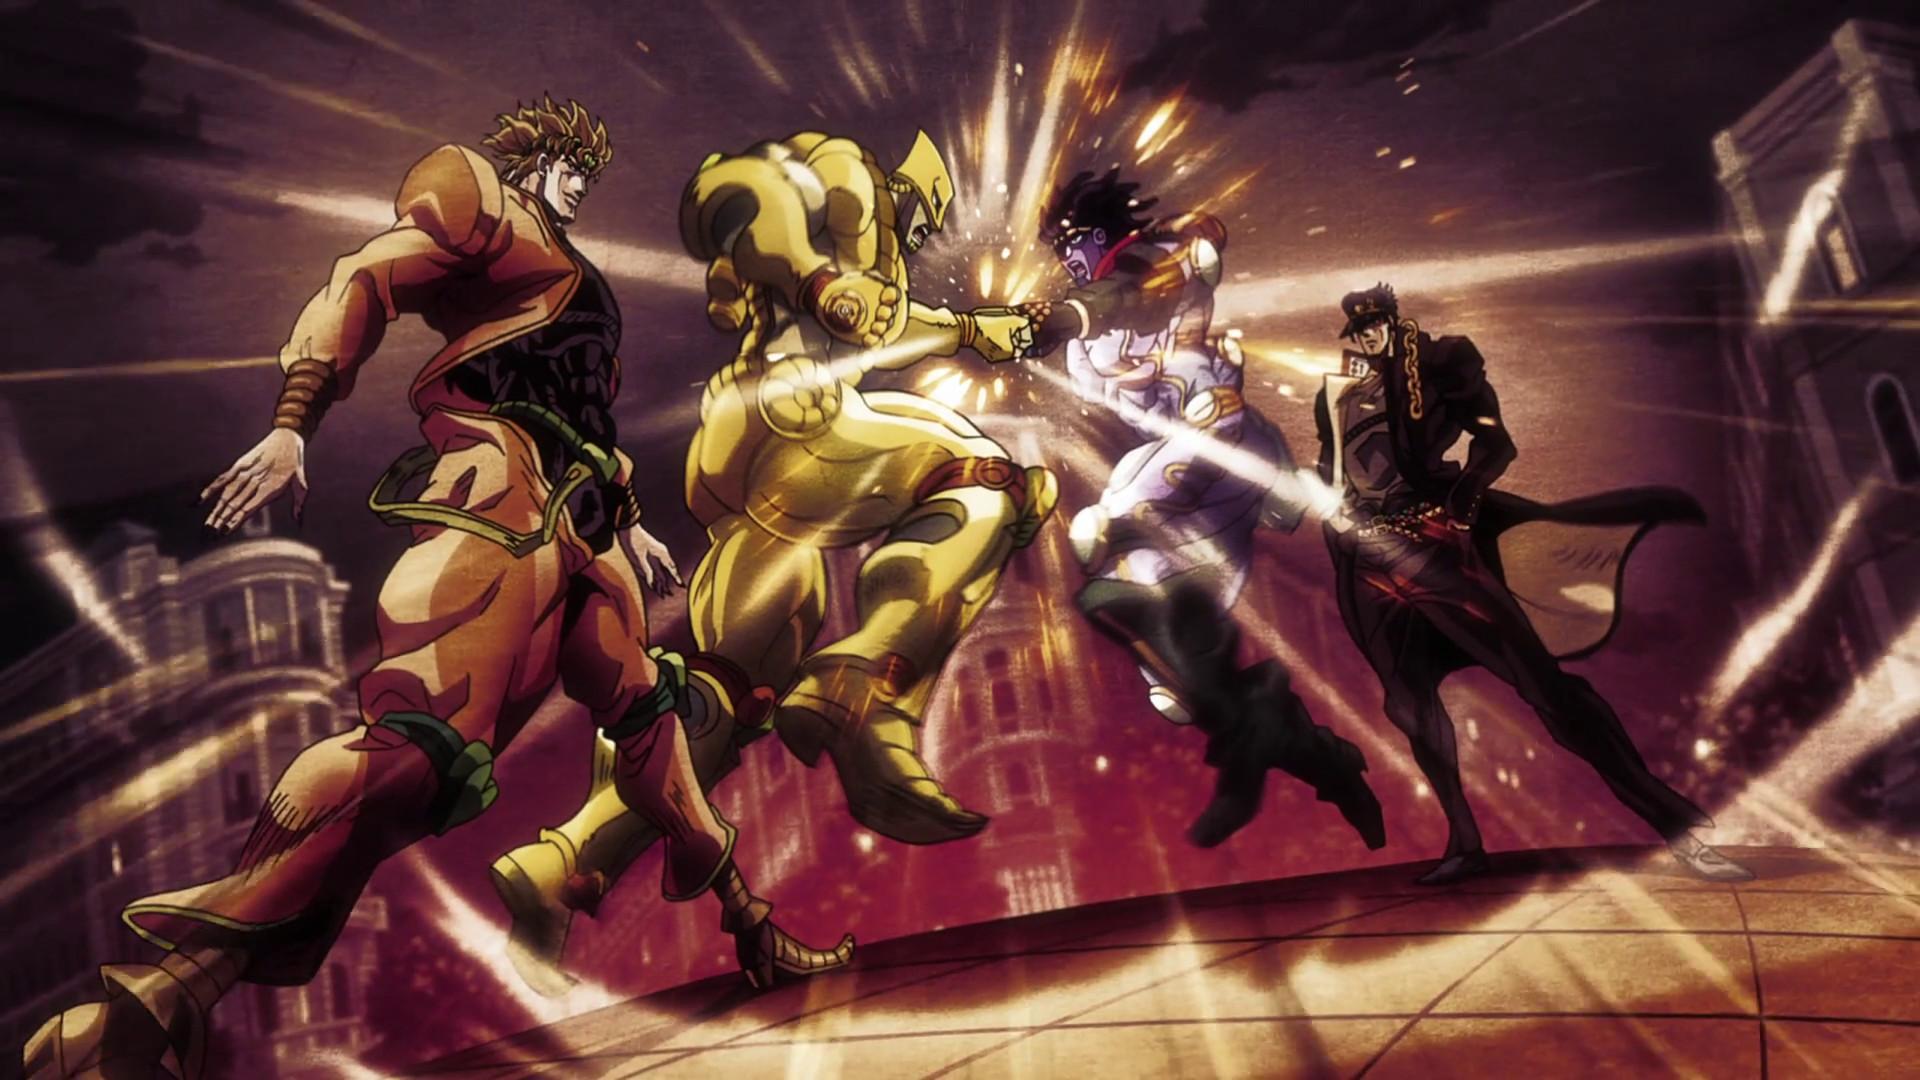 Anime JoJo's Bizarre Adventure: Stardust Crusaders Jotaro Kujo  DIO The World Star Platinum